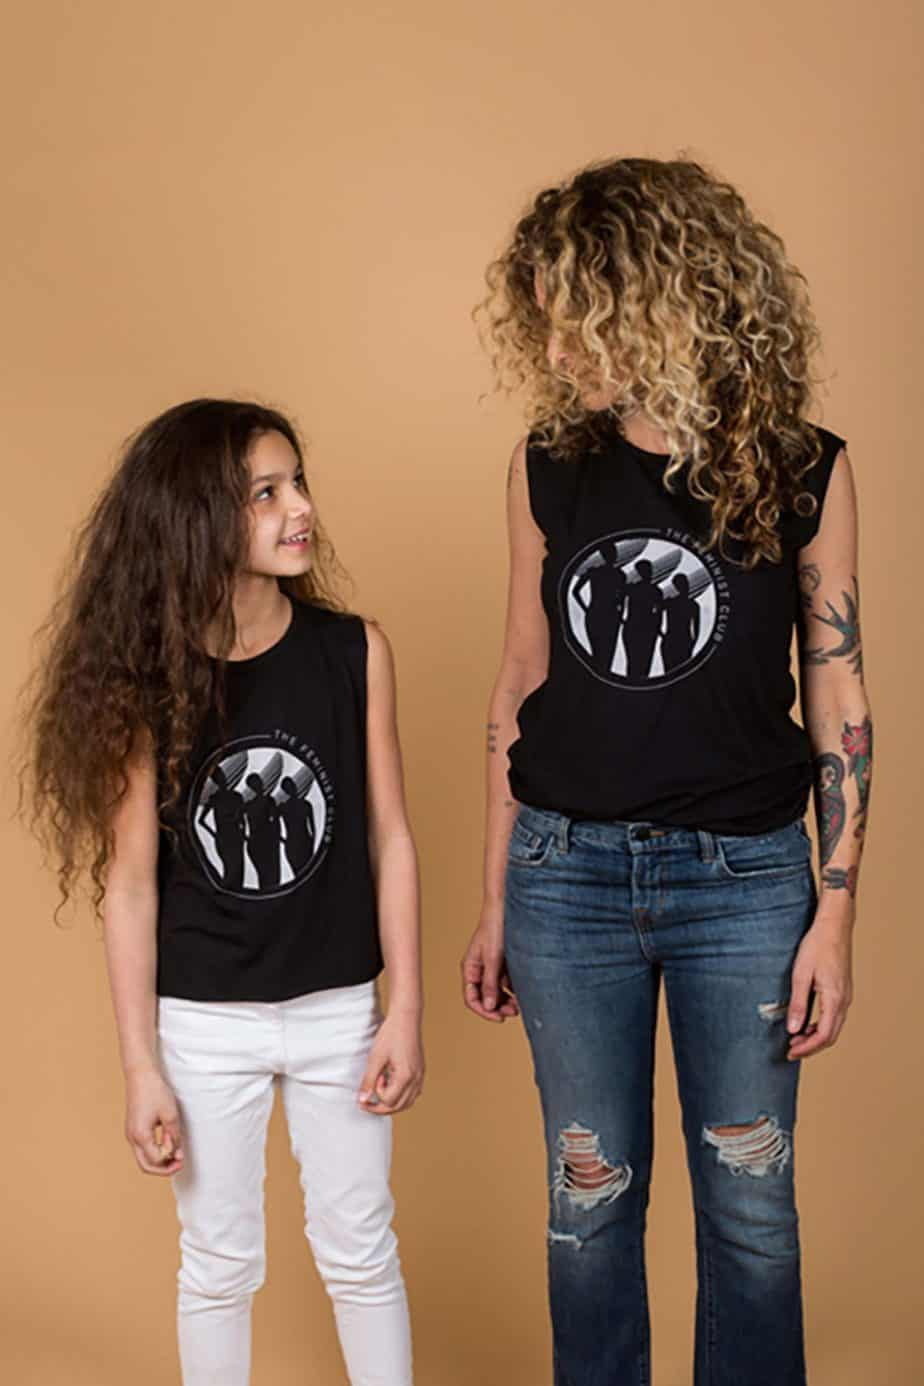 MissAnnette. מארז אם ובת. דגם קלאב. מחיר: 150 שקל, צילום מעיין סלע